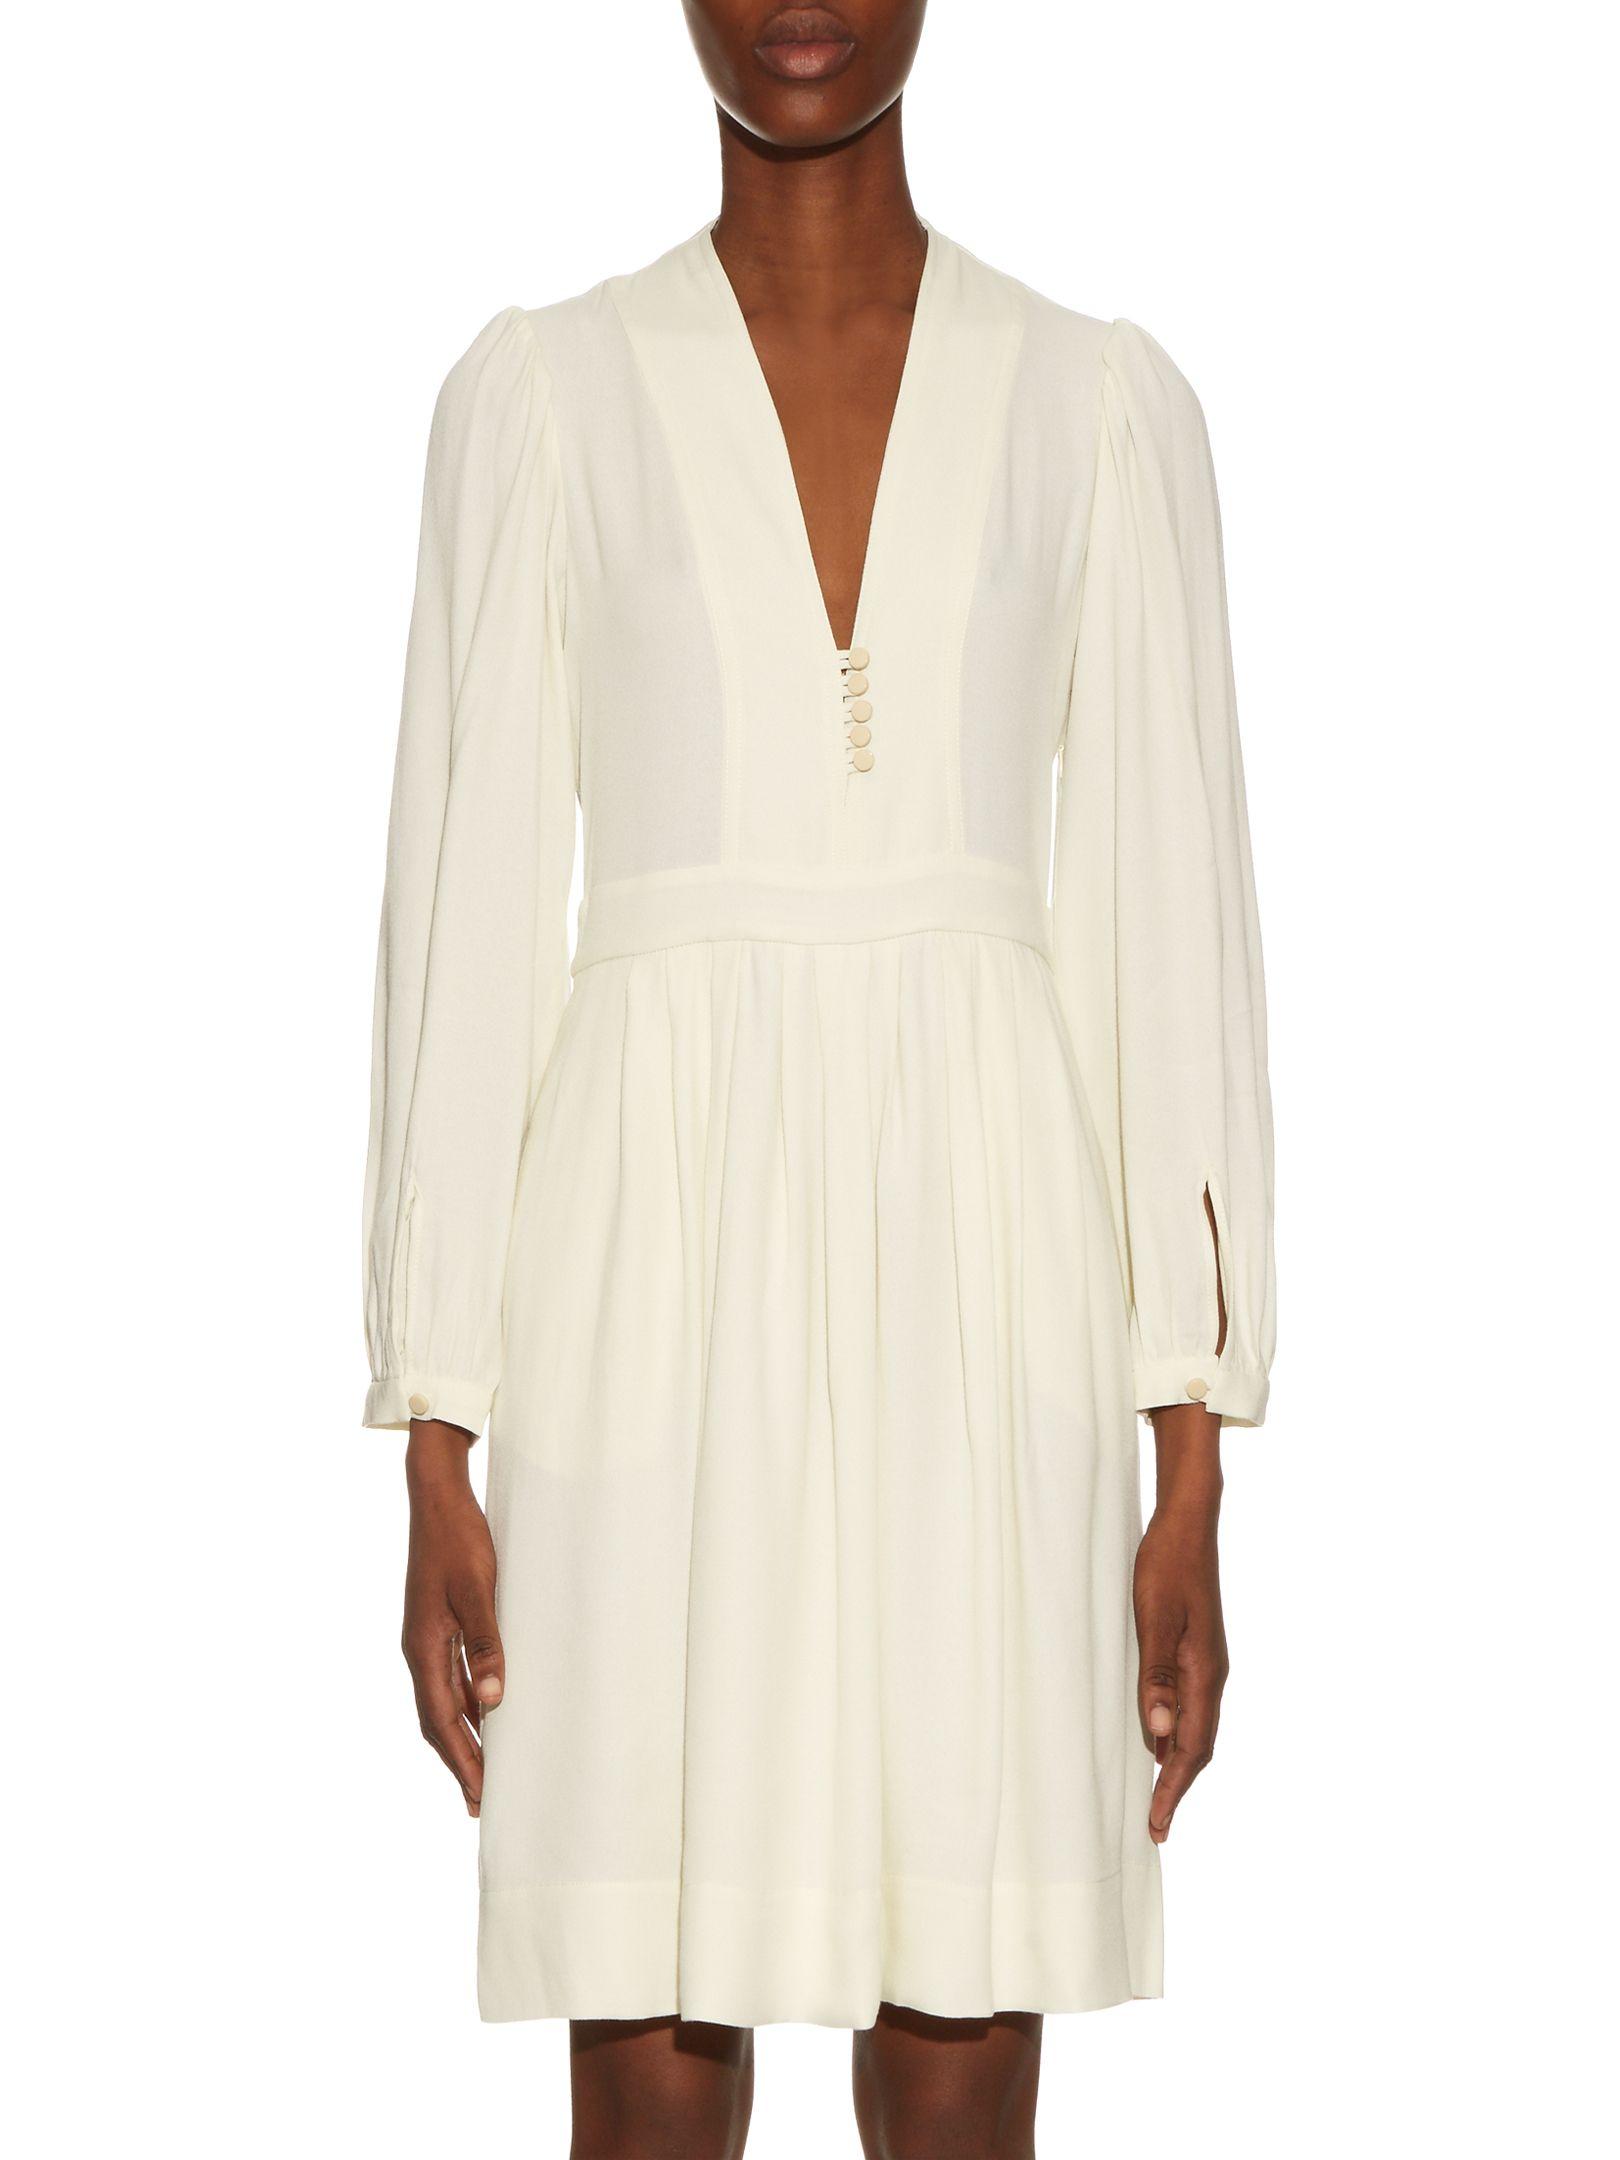 362209742f Click here to buy Isabel Marant Étoile Neil V-neck crepe dress at  MATCHESFASHION.COM